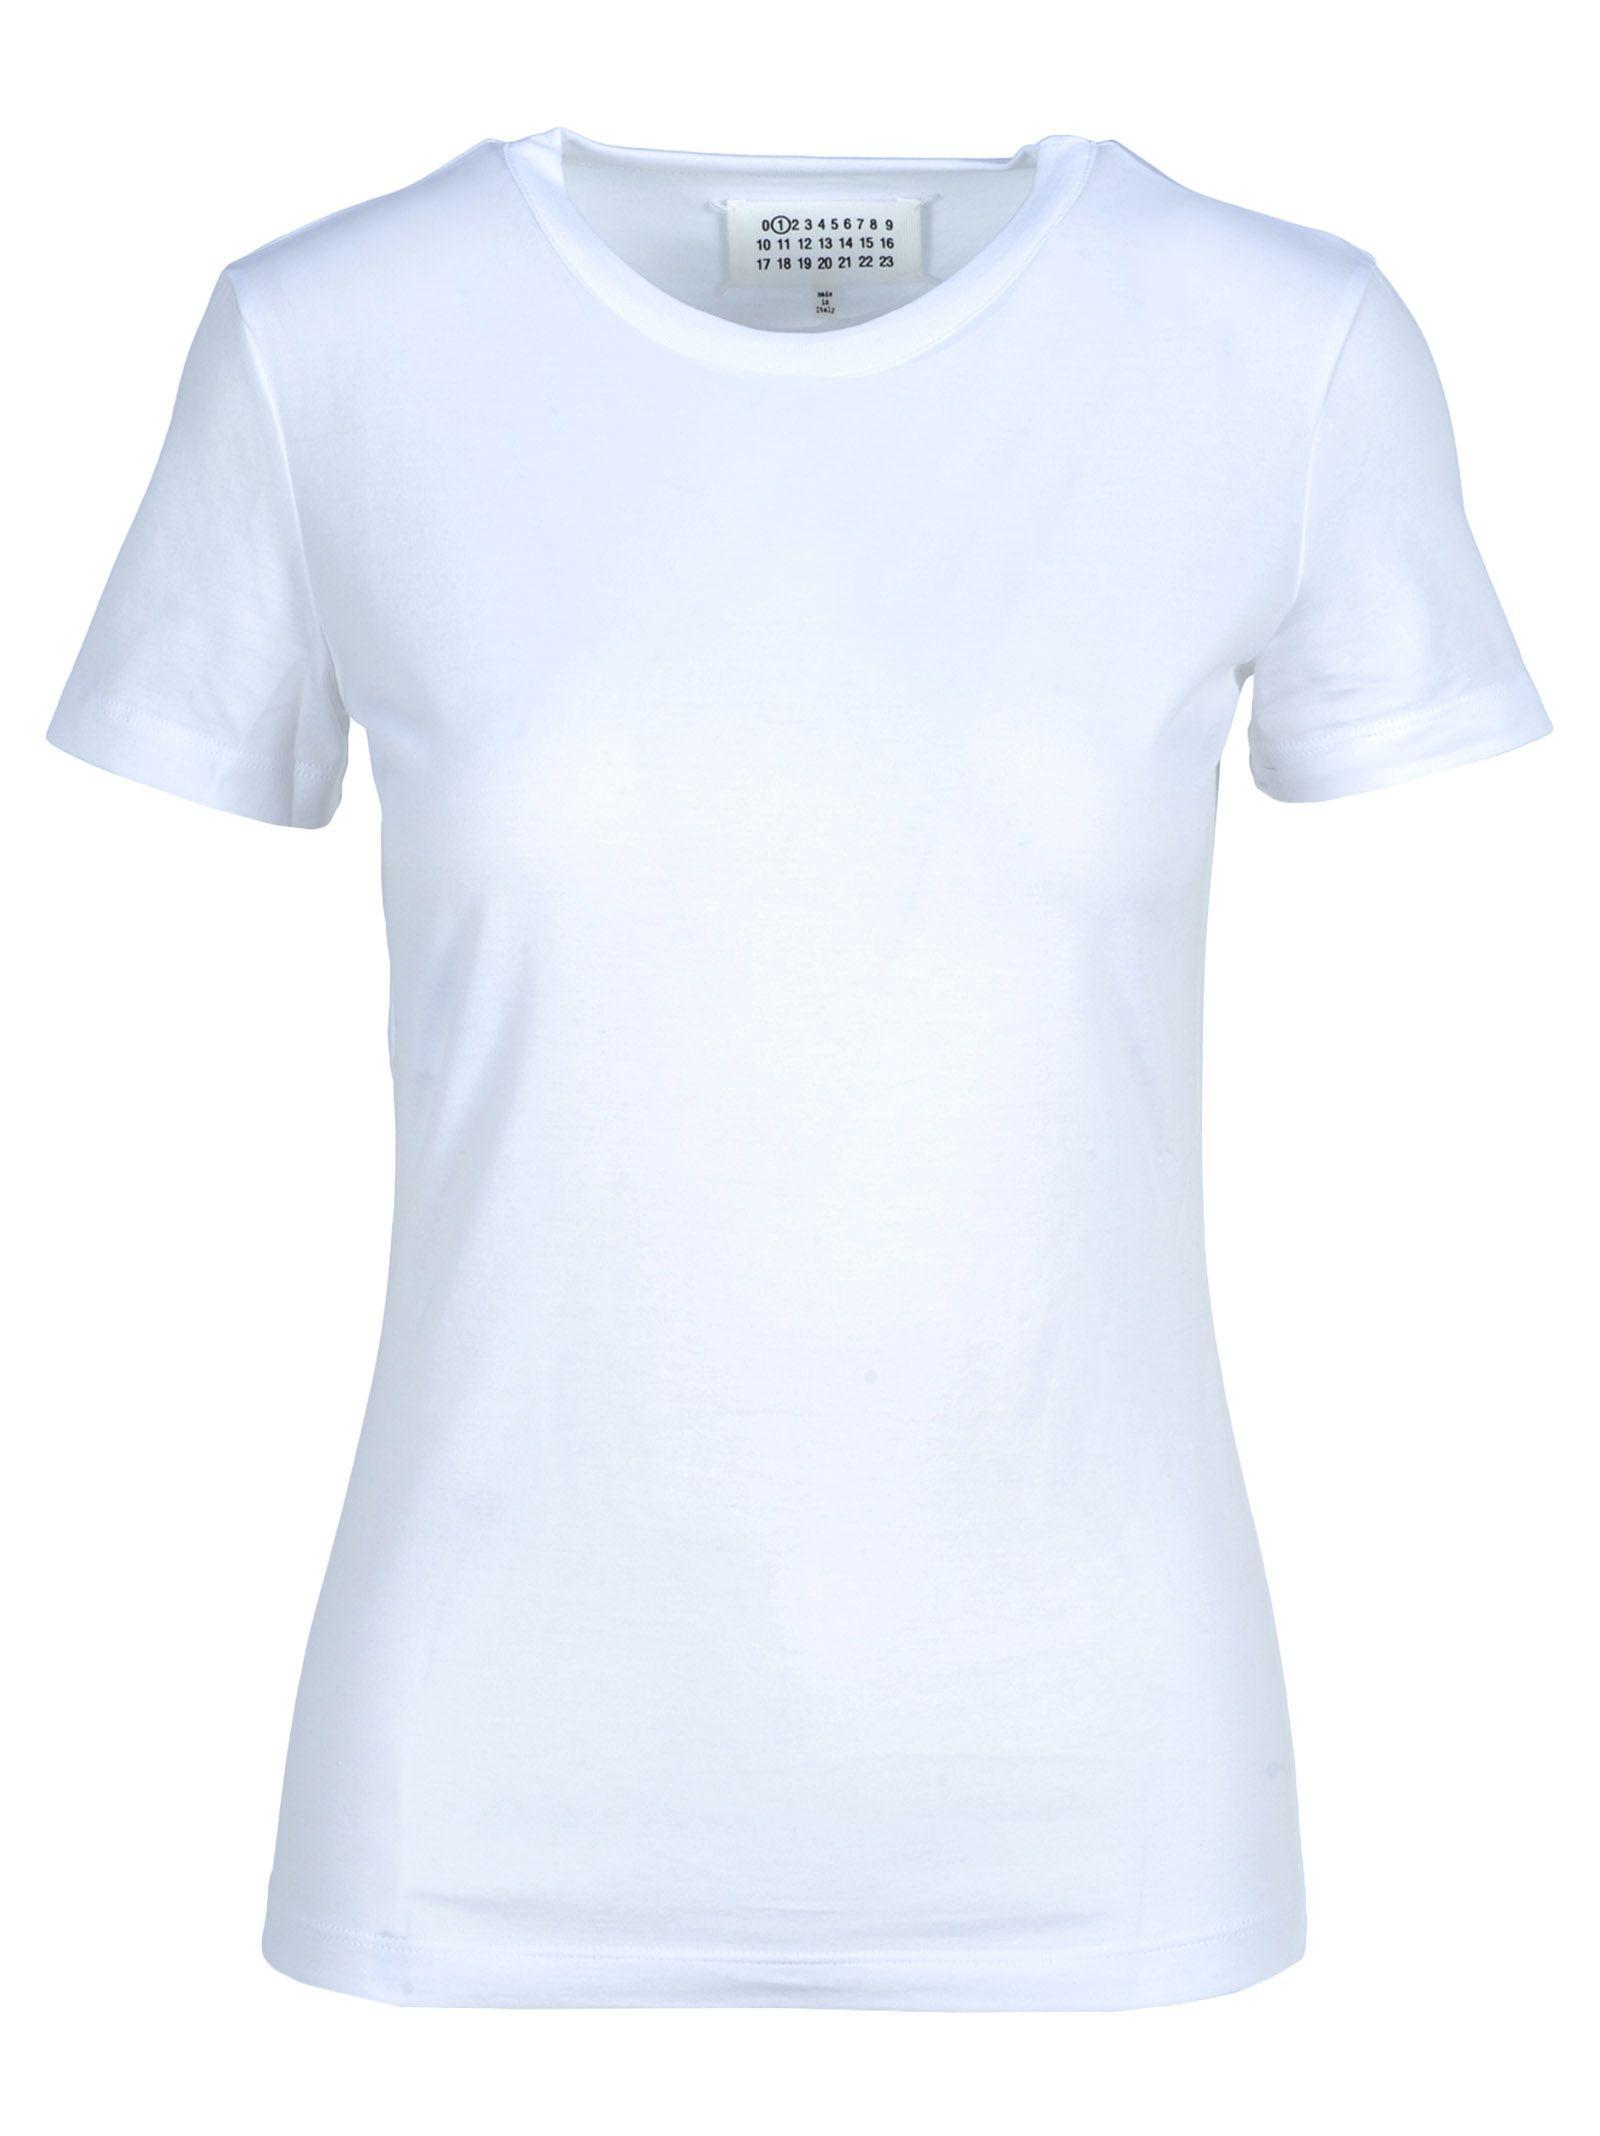 1b7b38fb2191 Maison Margiela Martin Margiela T-shirt - White - 10799483